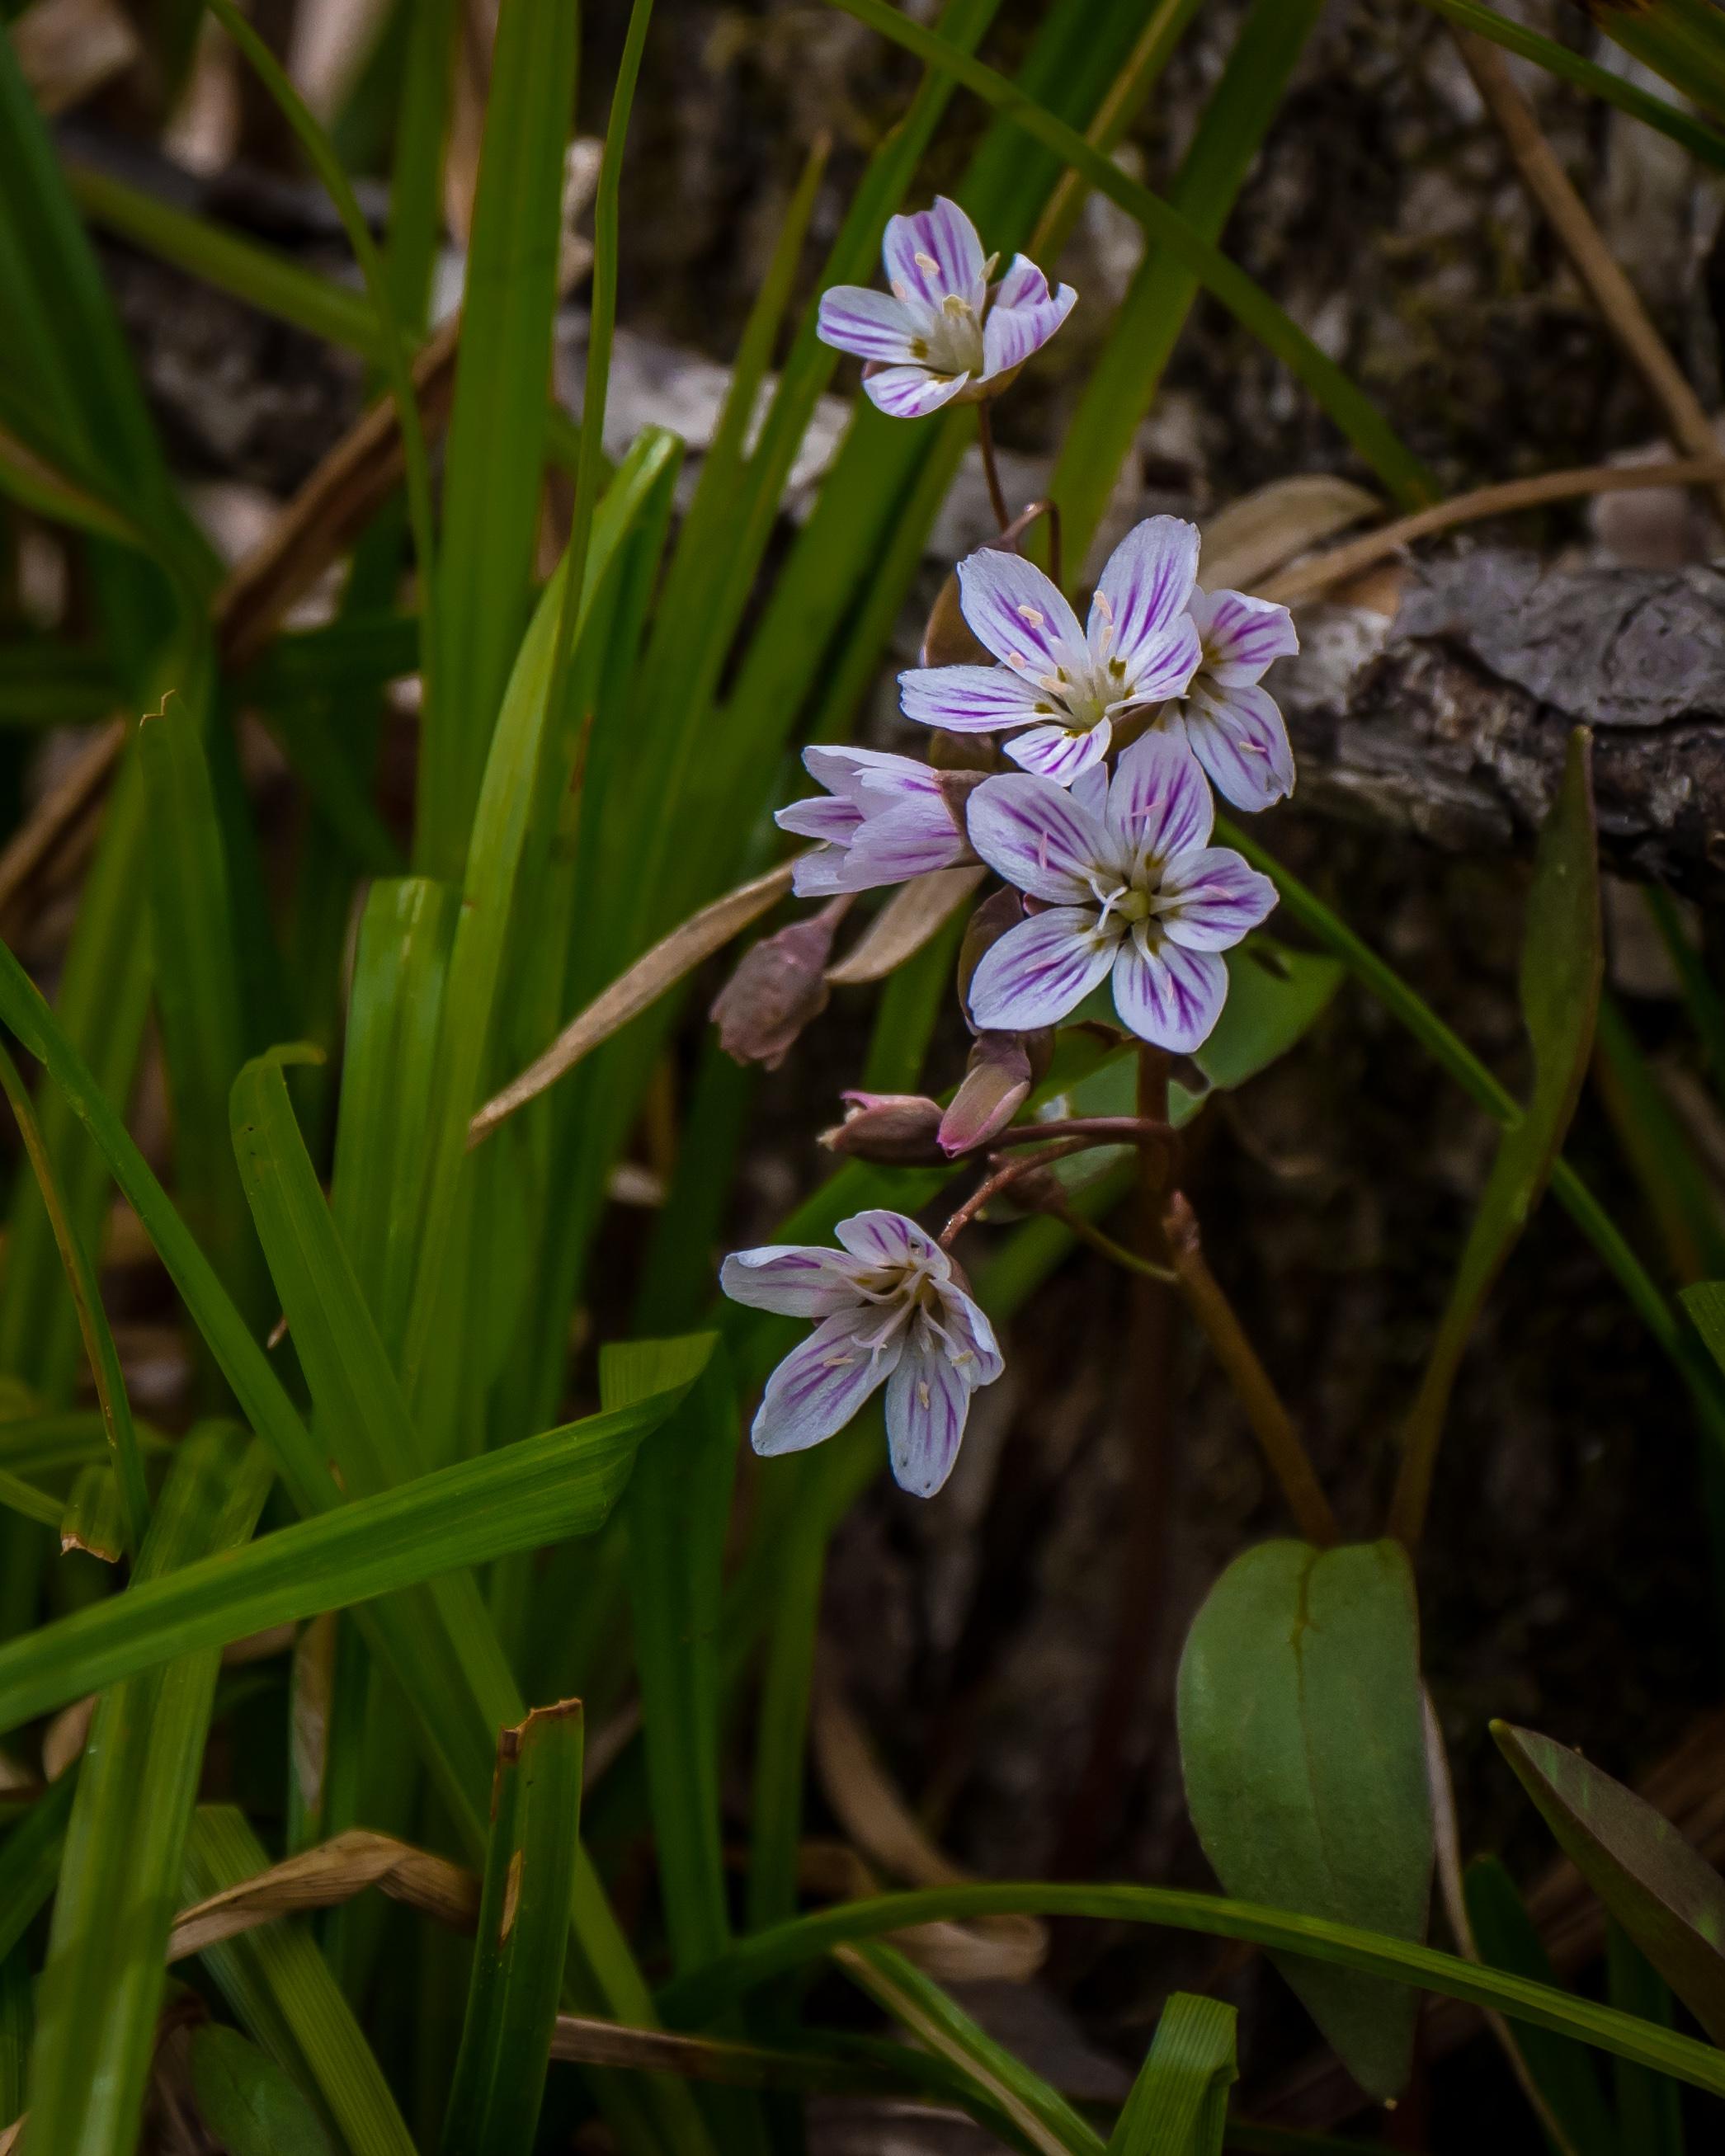 20170504 Honeysuckle Carolina Spring Beauty Trout Lily Trillium